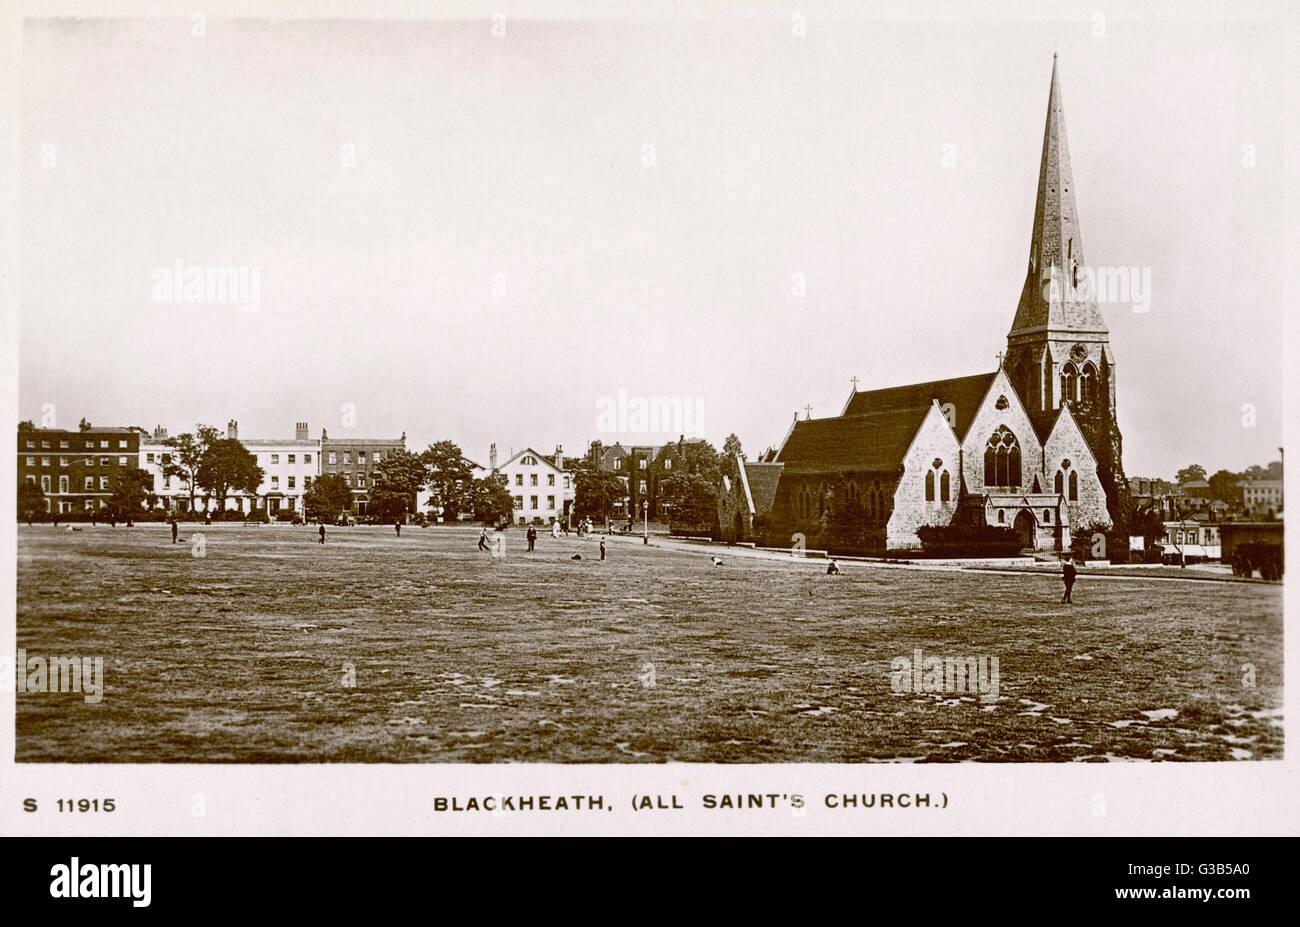 All Saints' Church, Blackheath        Date: early 20th century - Stock Image